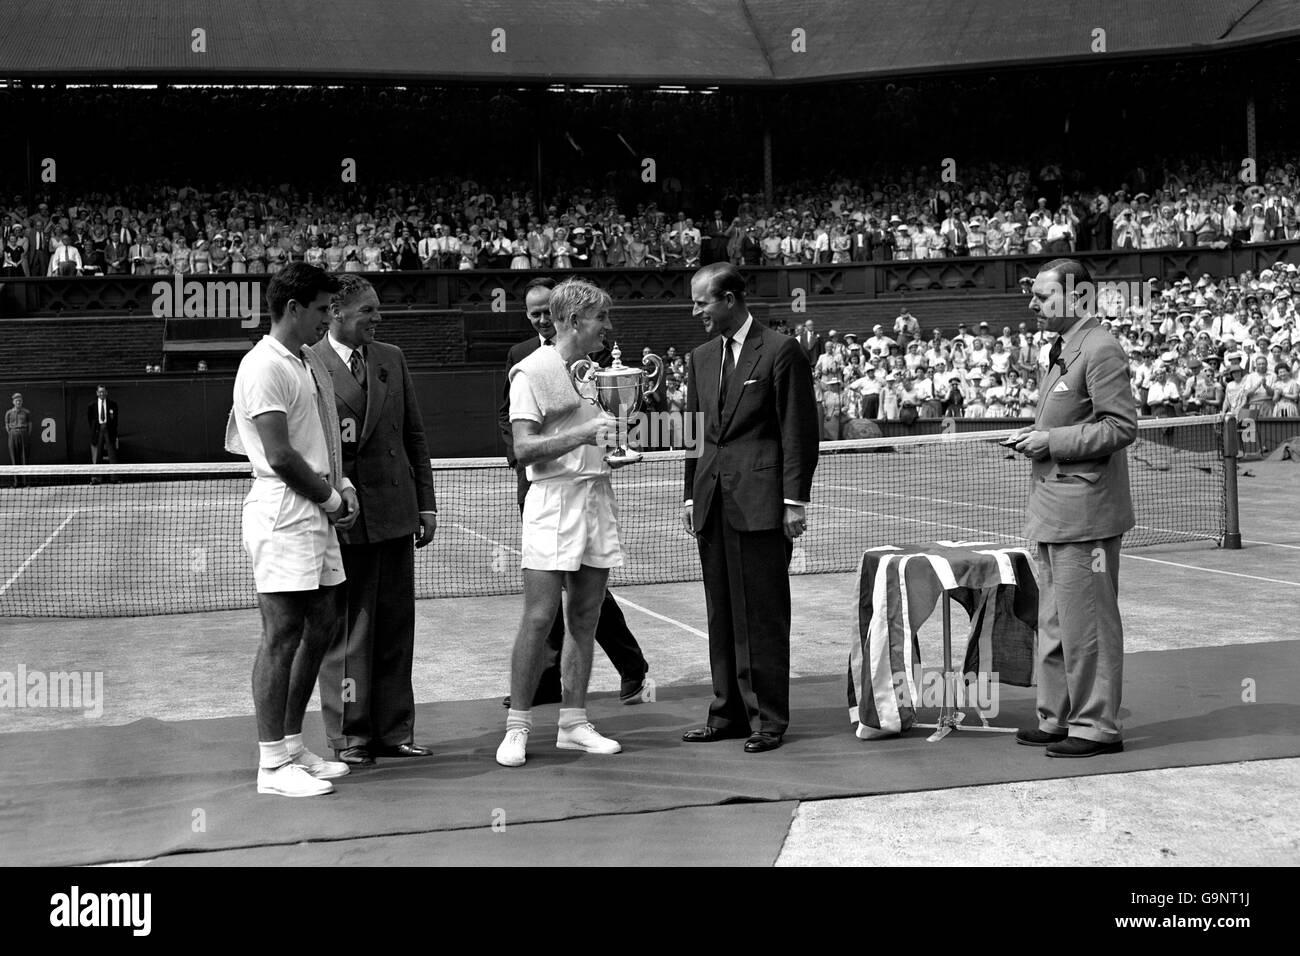 Tennis Wimbledon Championships Men s Singles Final Lew Hoad